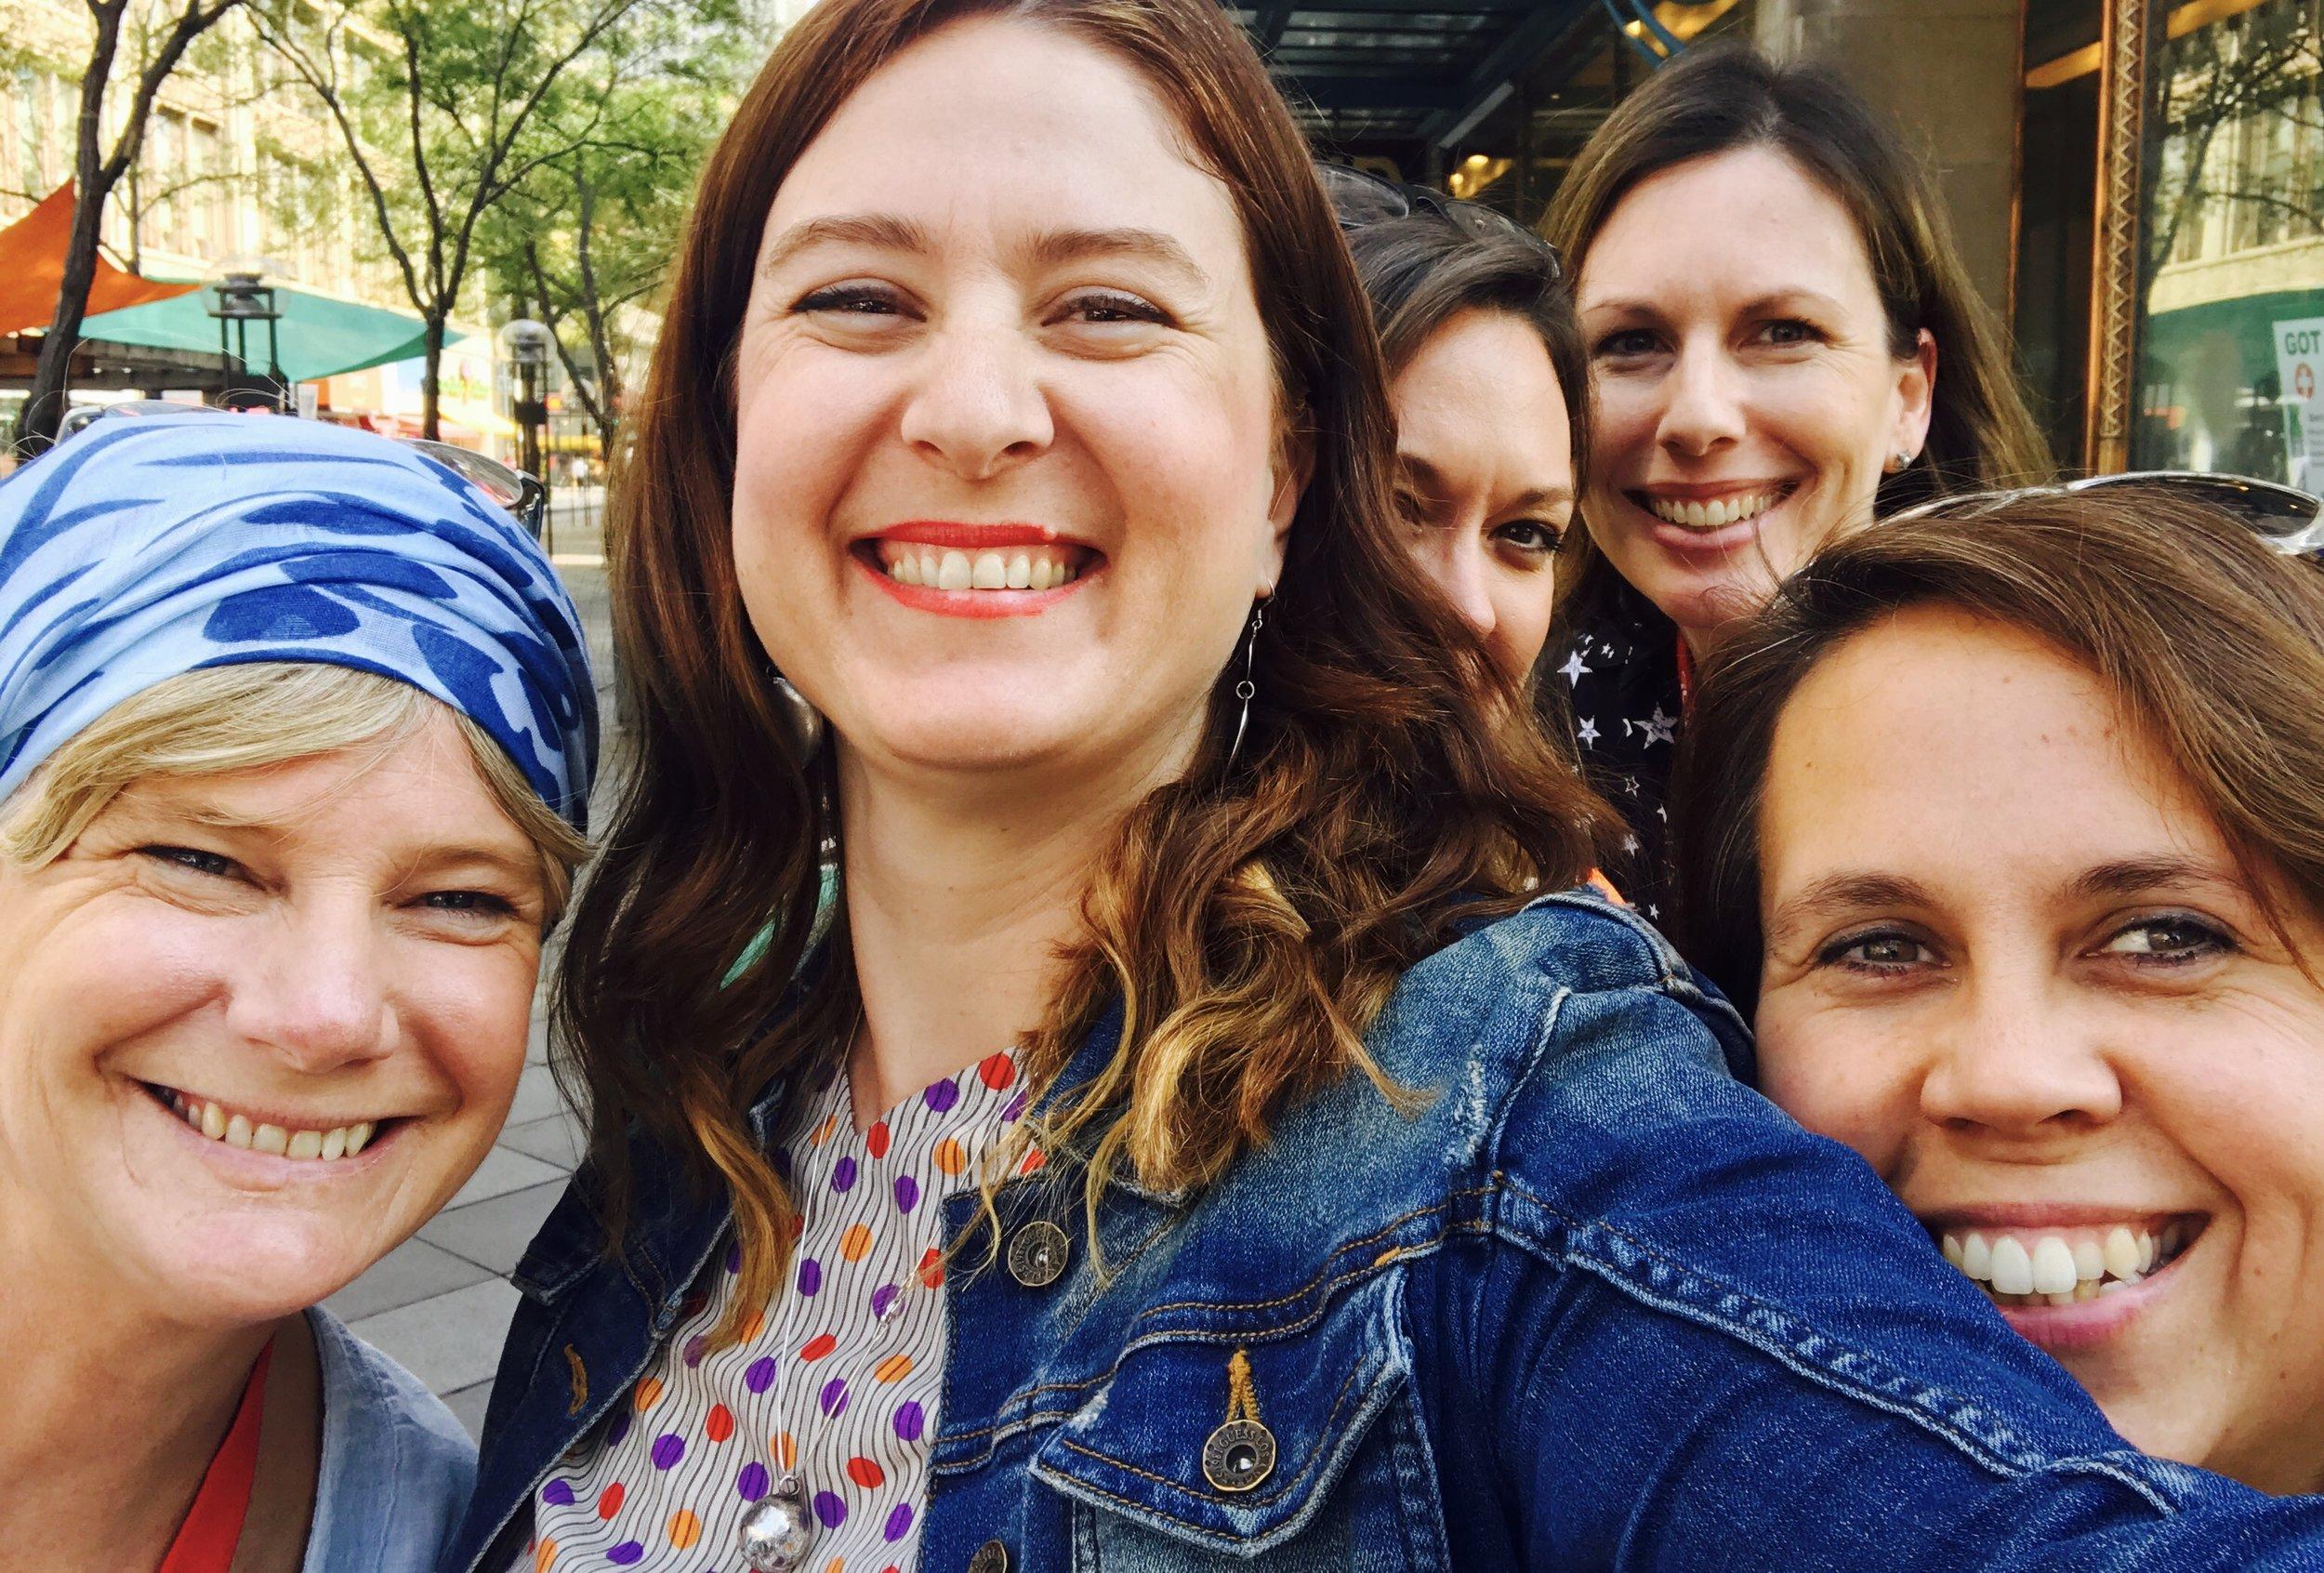 Intrepid research field team - Lenni, Elle, Karen, Sally and Mel